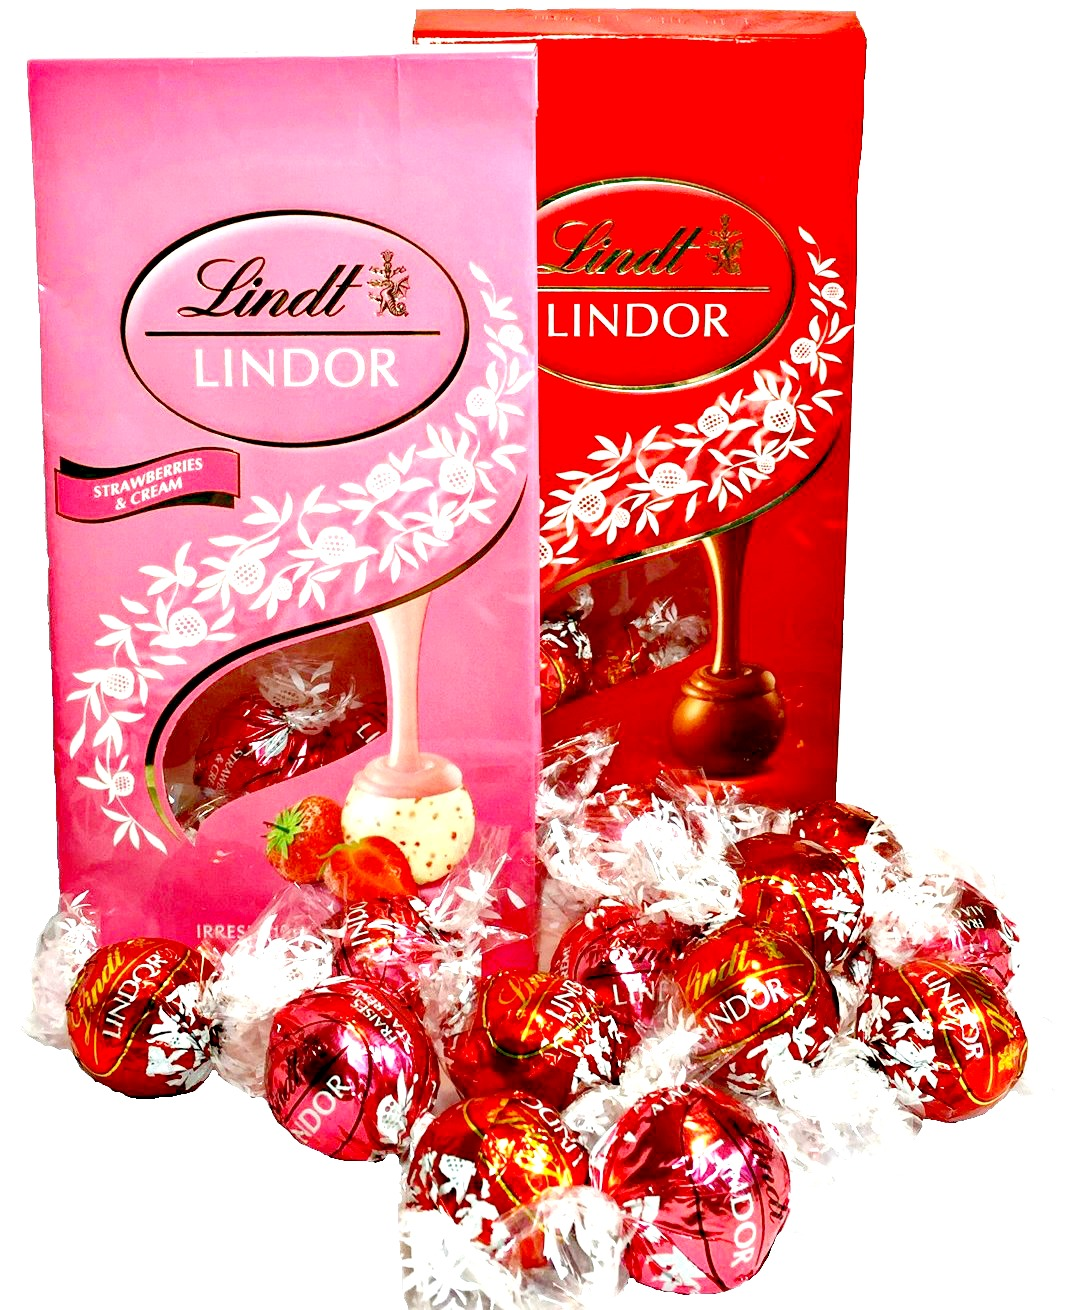 Chokladlådan Lindor Lindt XL